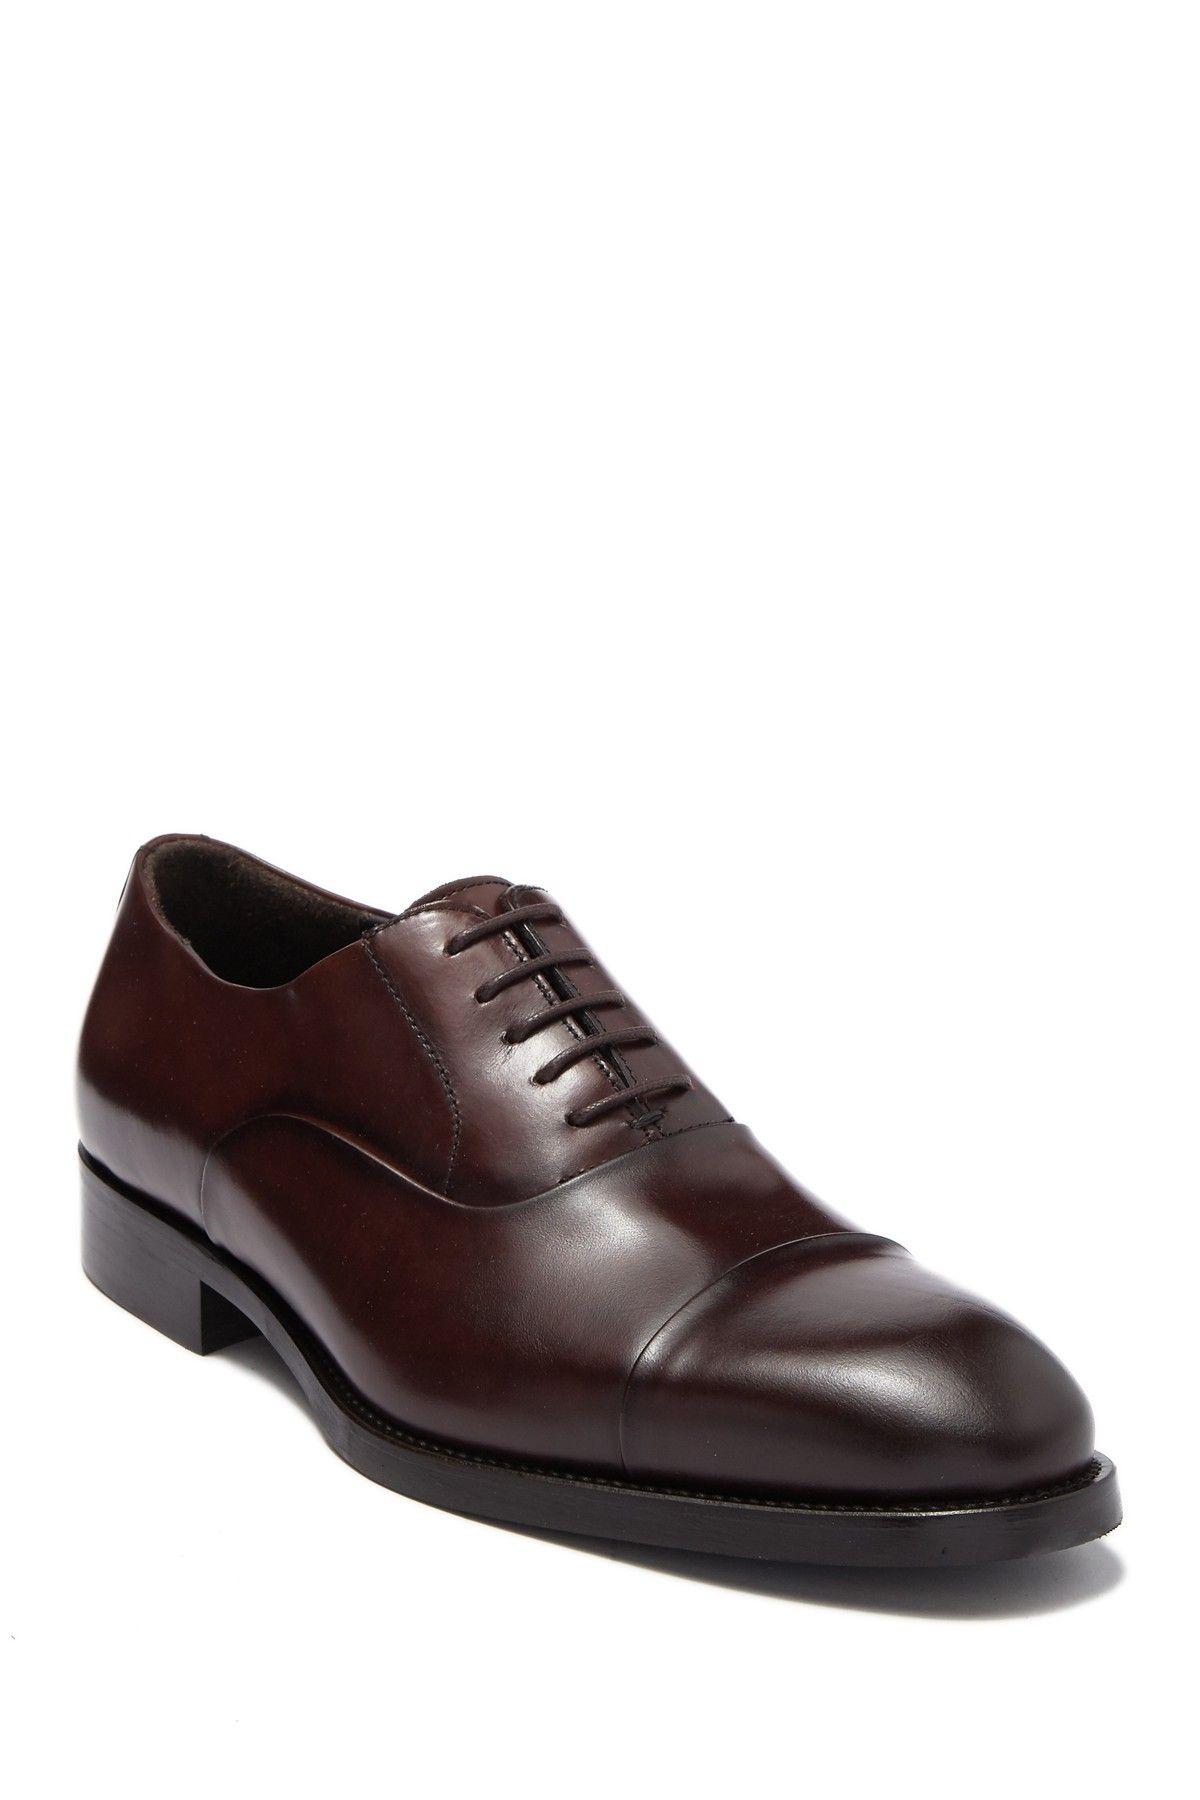 To Boot New York | Beragamo Leather Oxford #nordstromrack